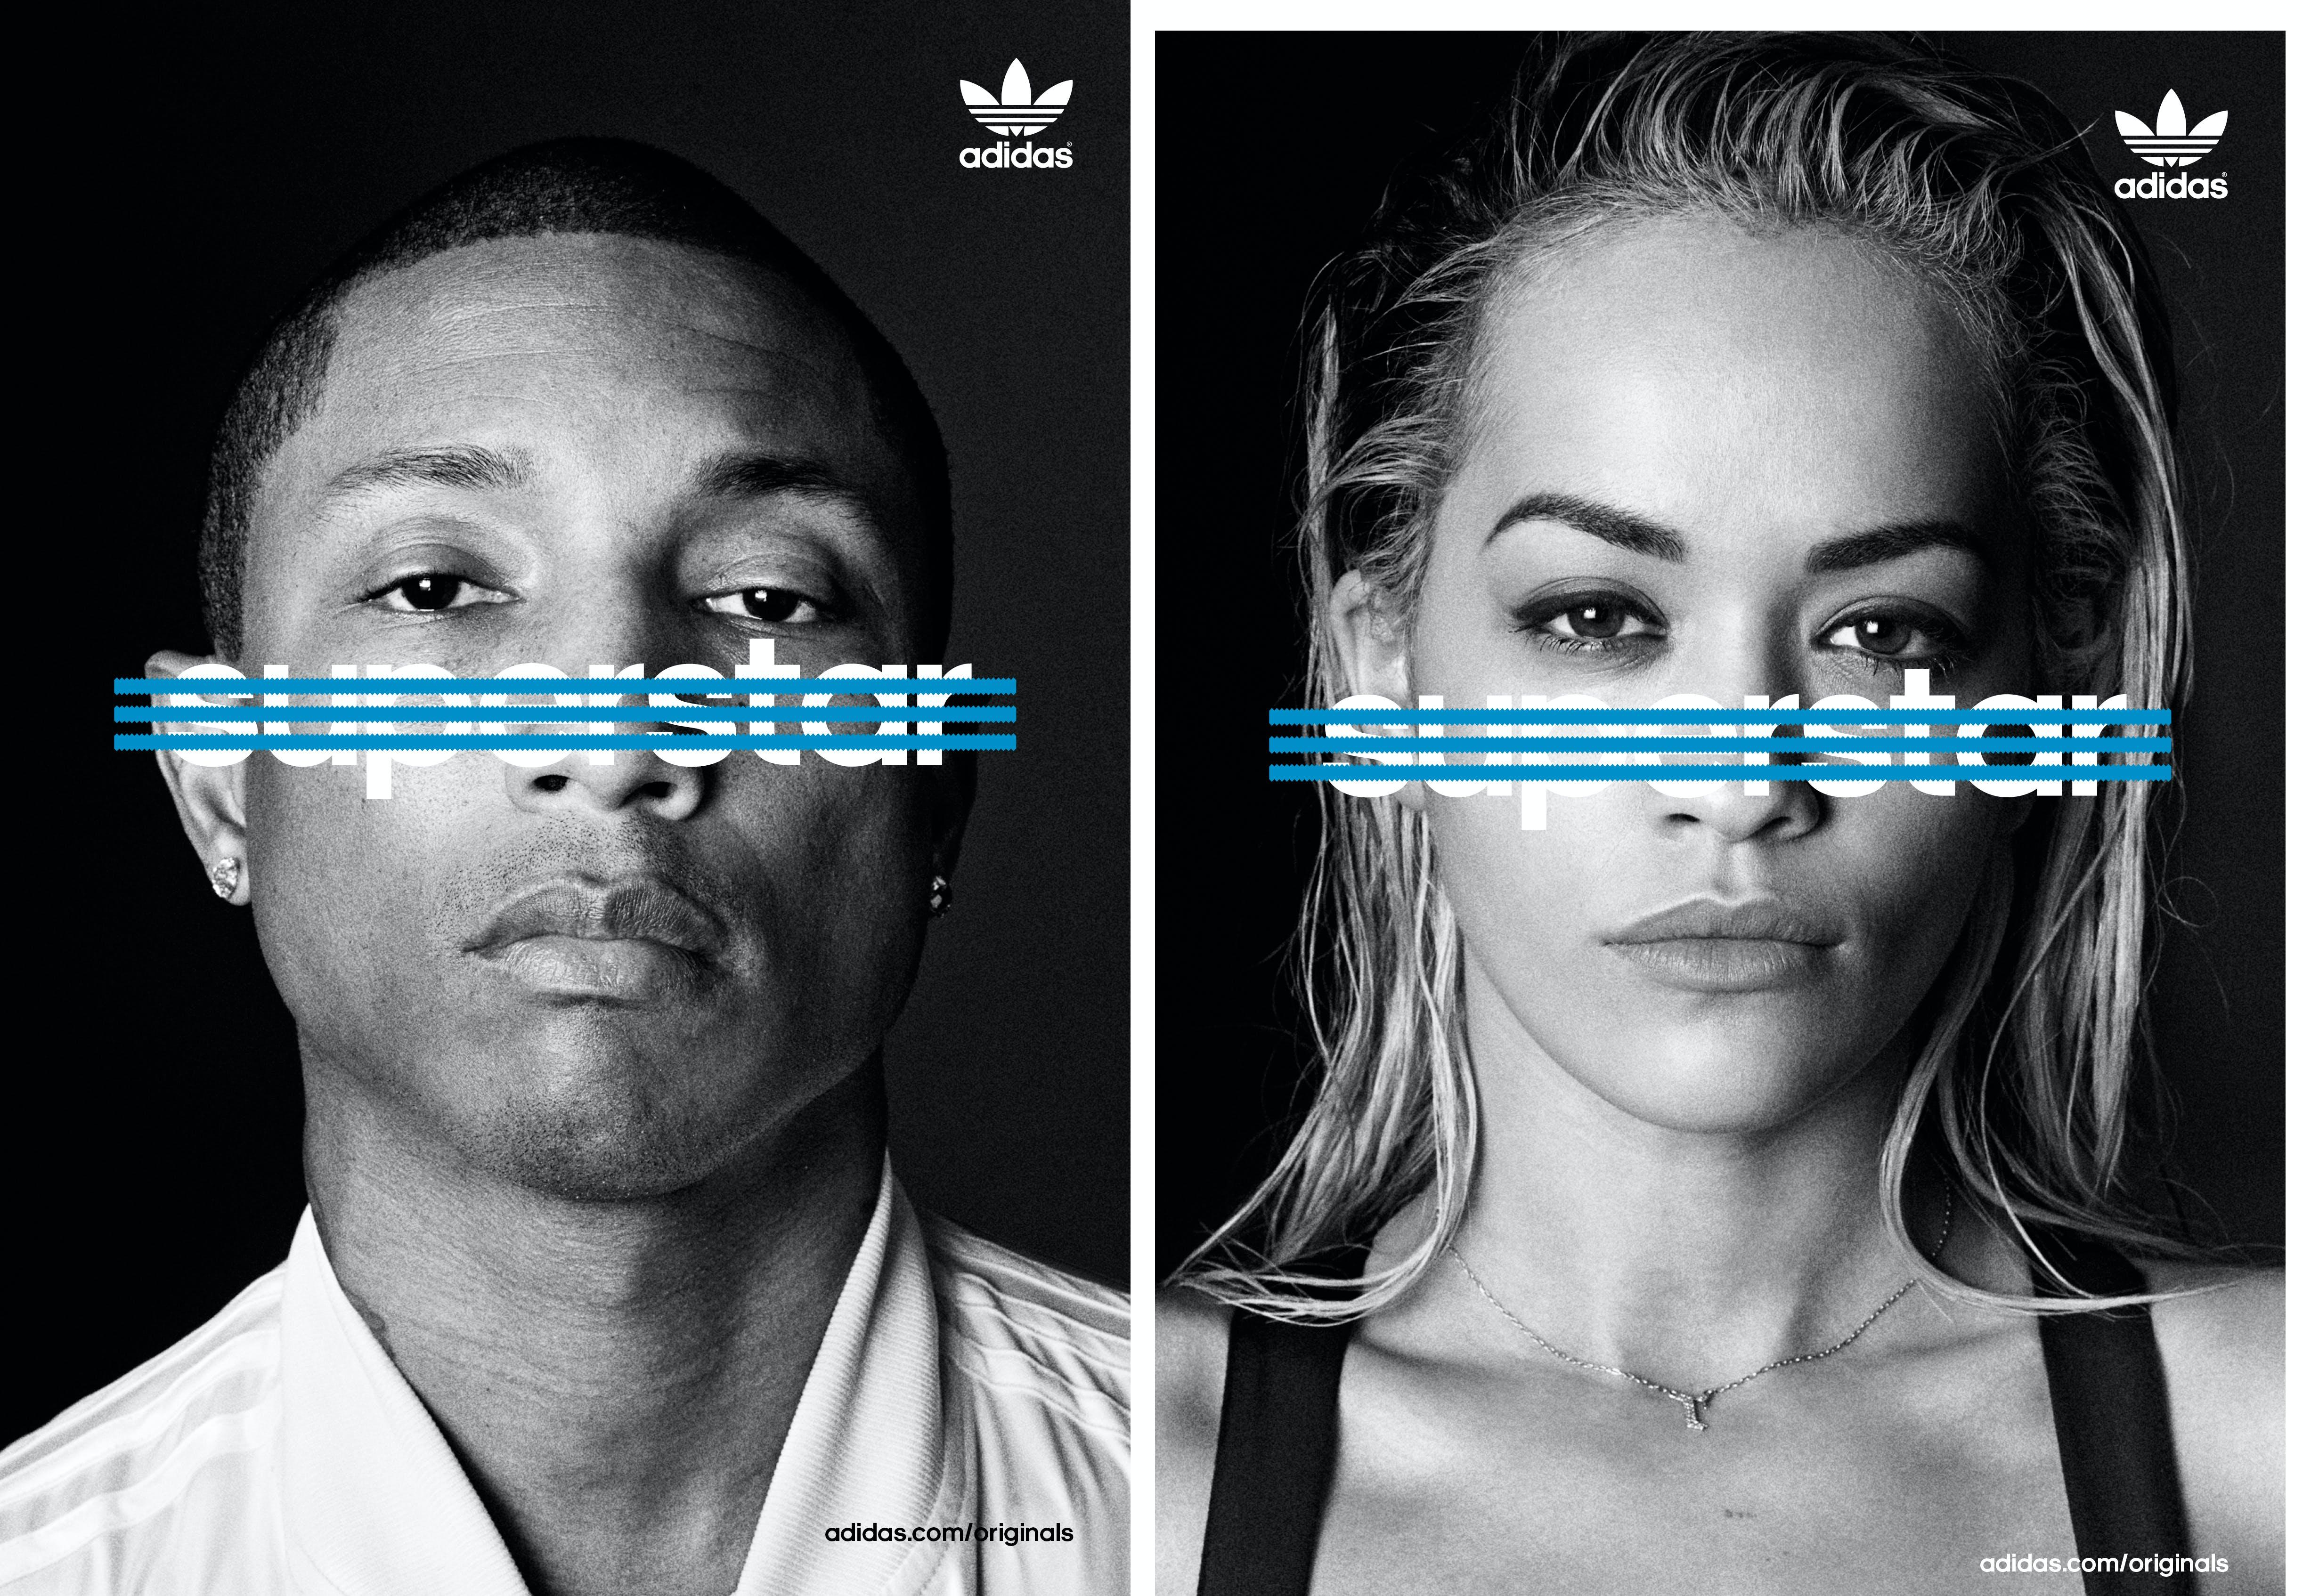 adidas head of marketing uk